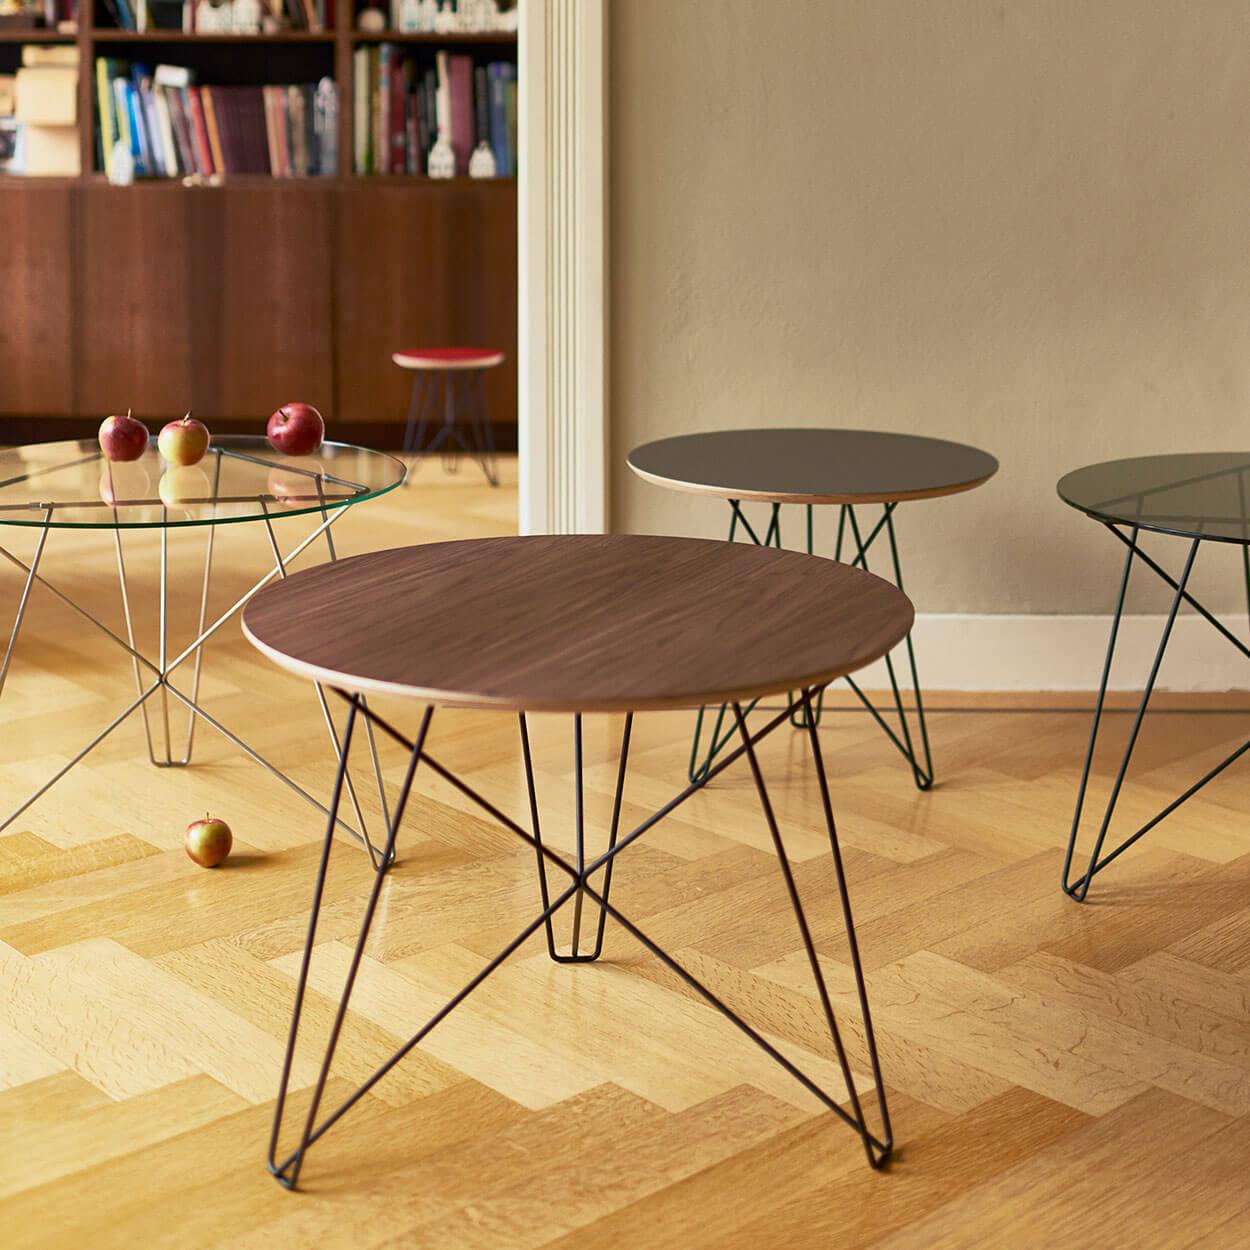 2 Glazen Bijzettafeltjes.Ijhorst Side Tables Spectrum Design